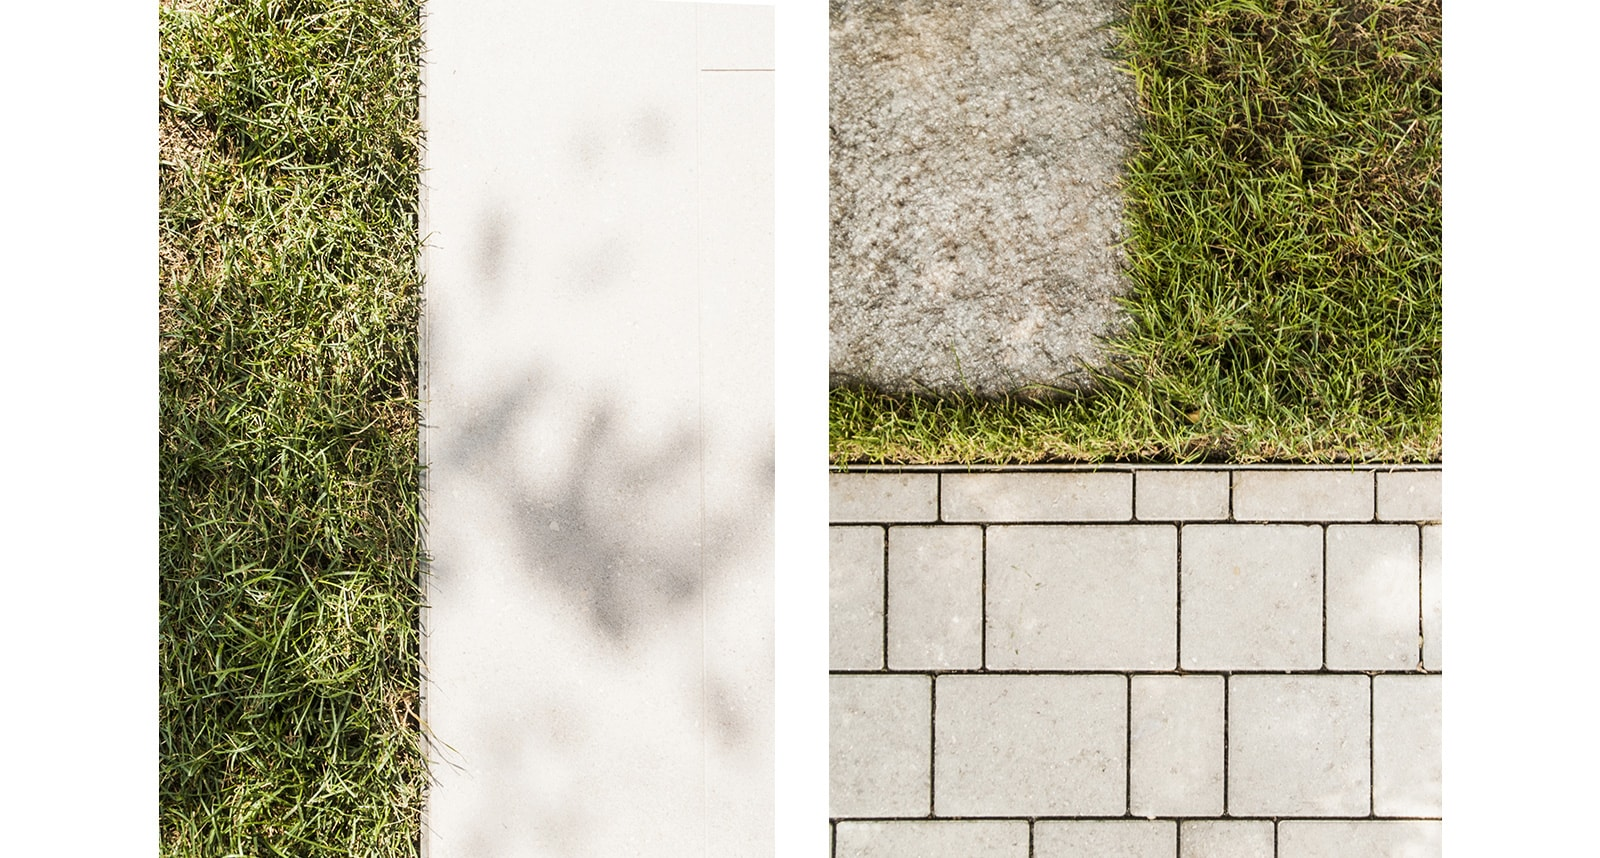 casa-giardino-via-berzuini-34-junctions